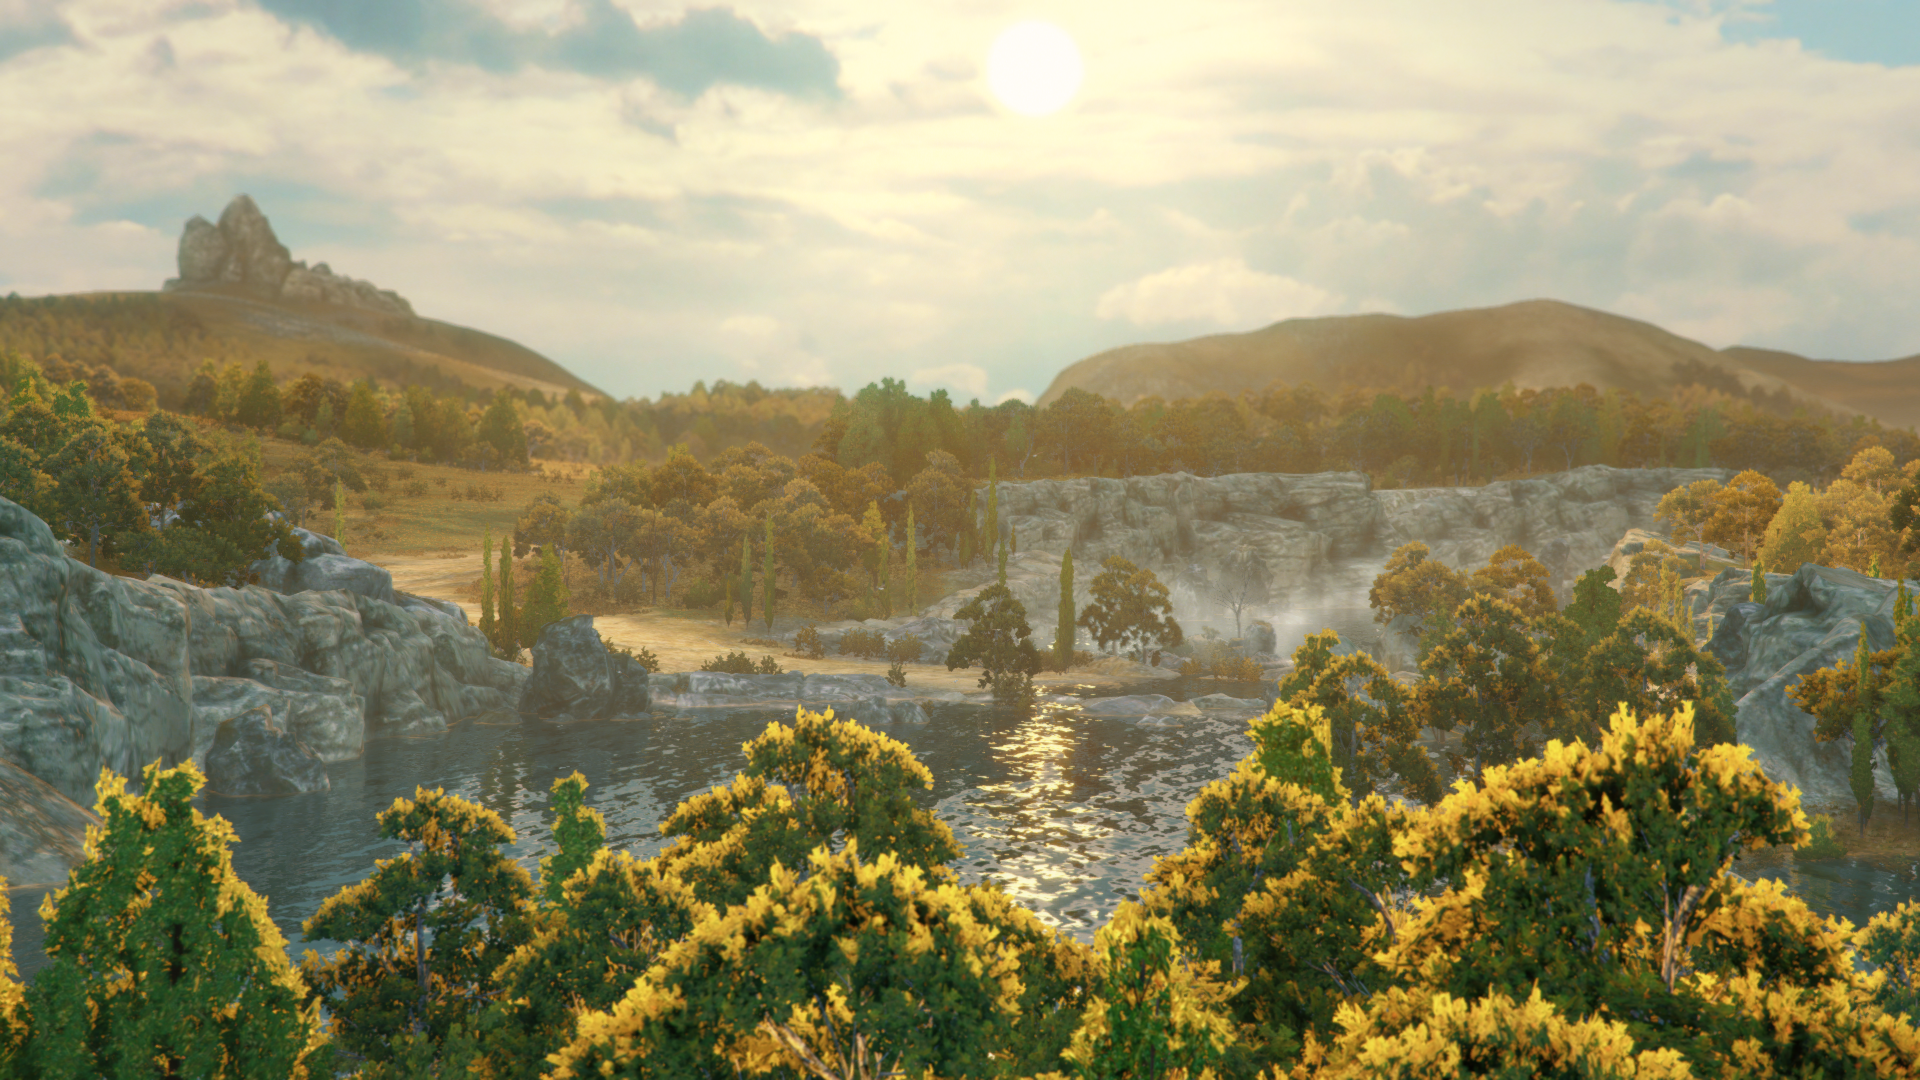 Troy-Total-War-screenshot -6-